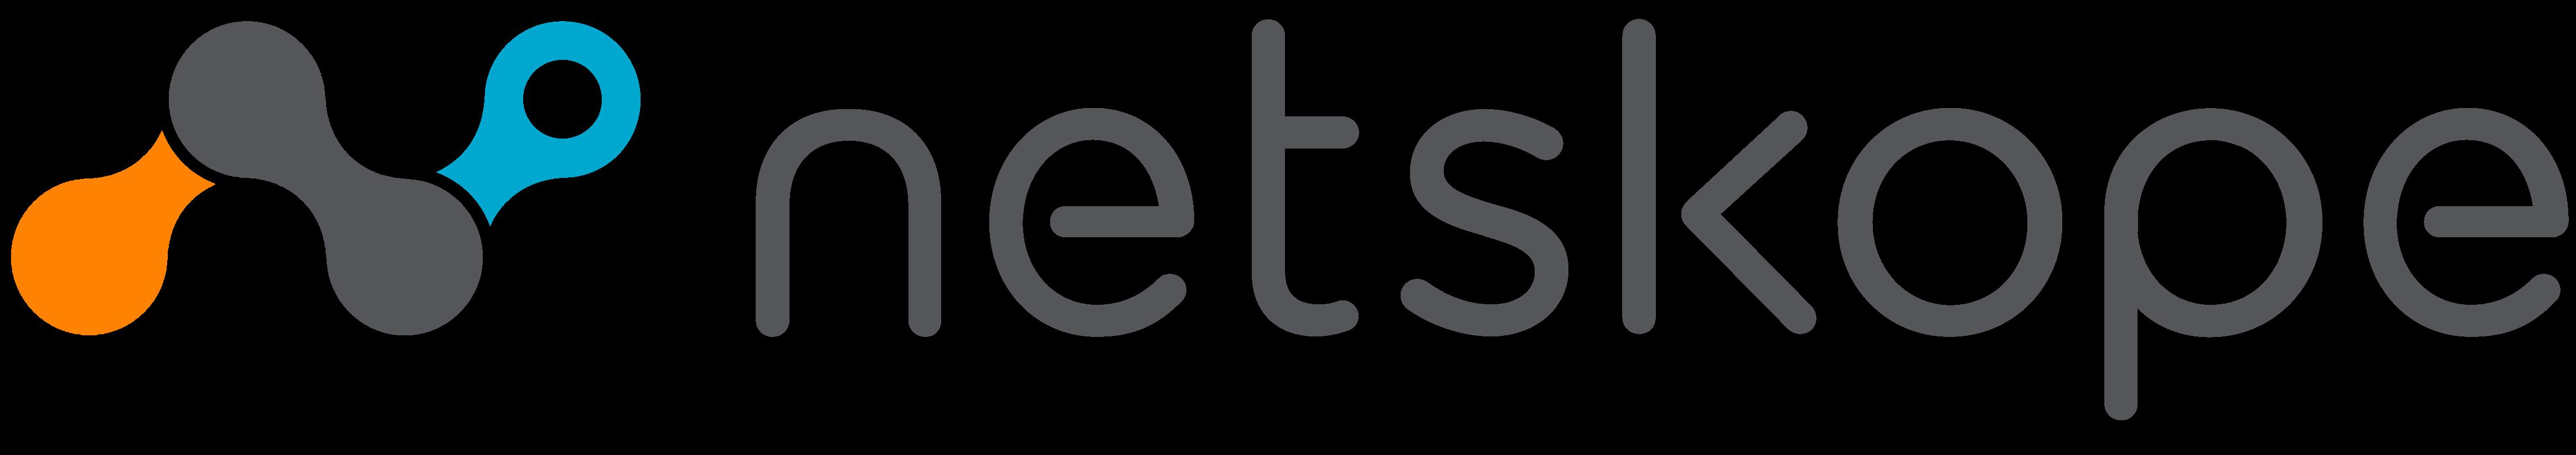 Netskope logo logotype